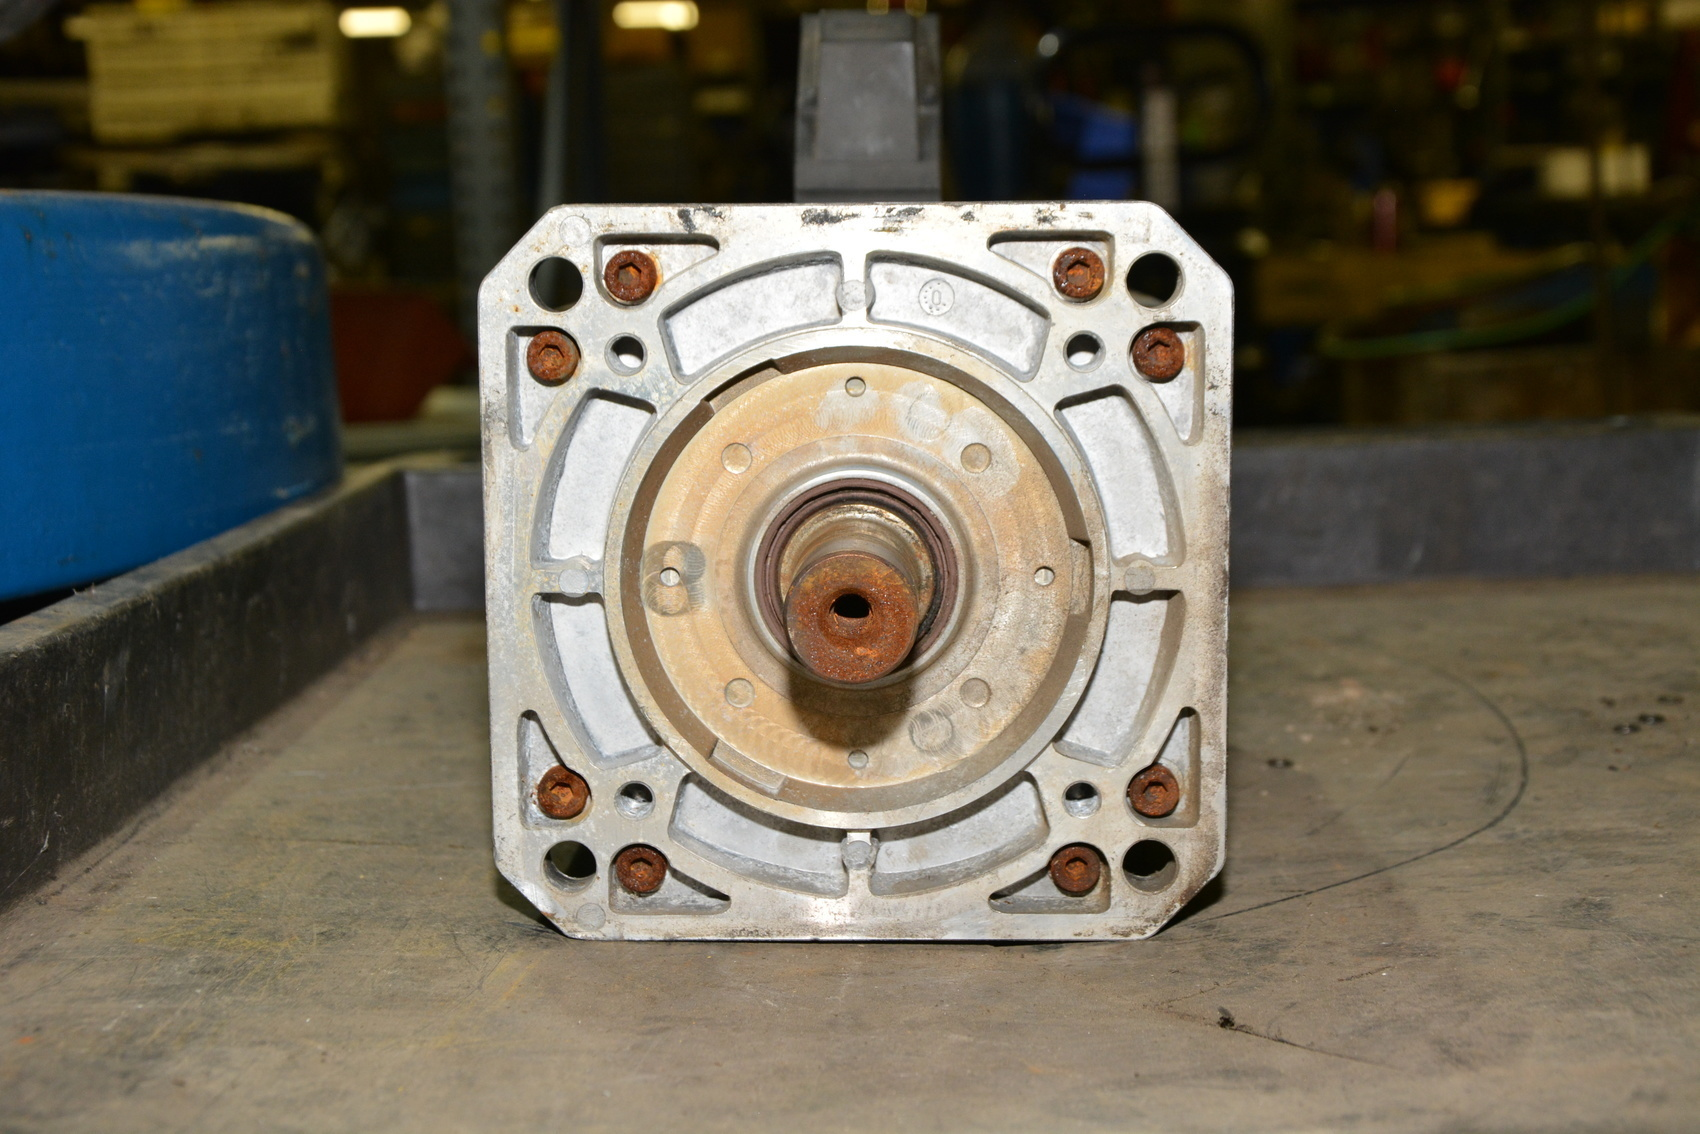 Heidenhain Cnc Qsy112b Brake Servo Motor 1 9kw 3ph 200hz